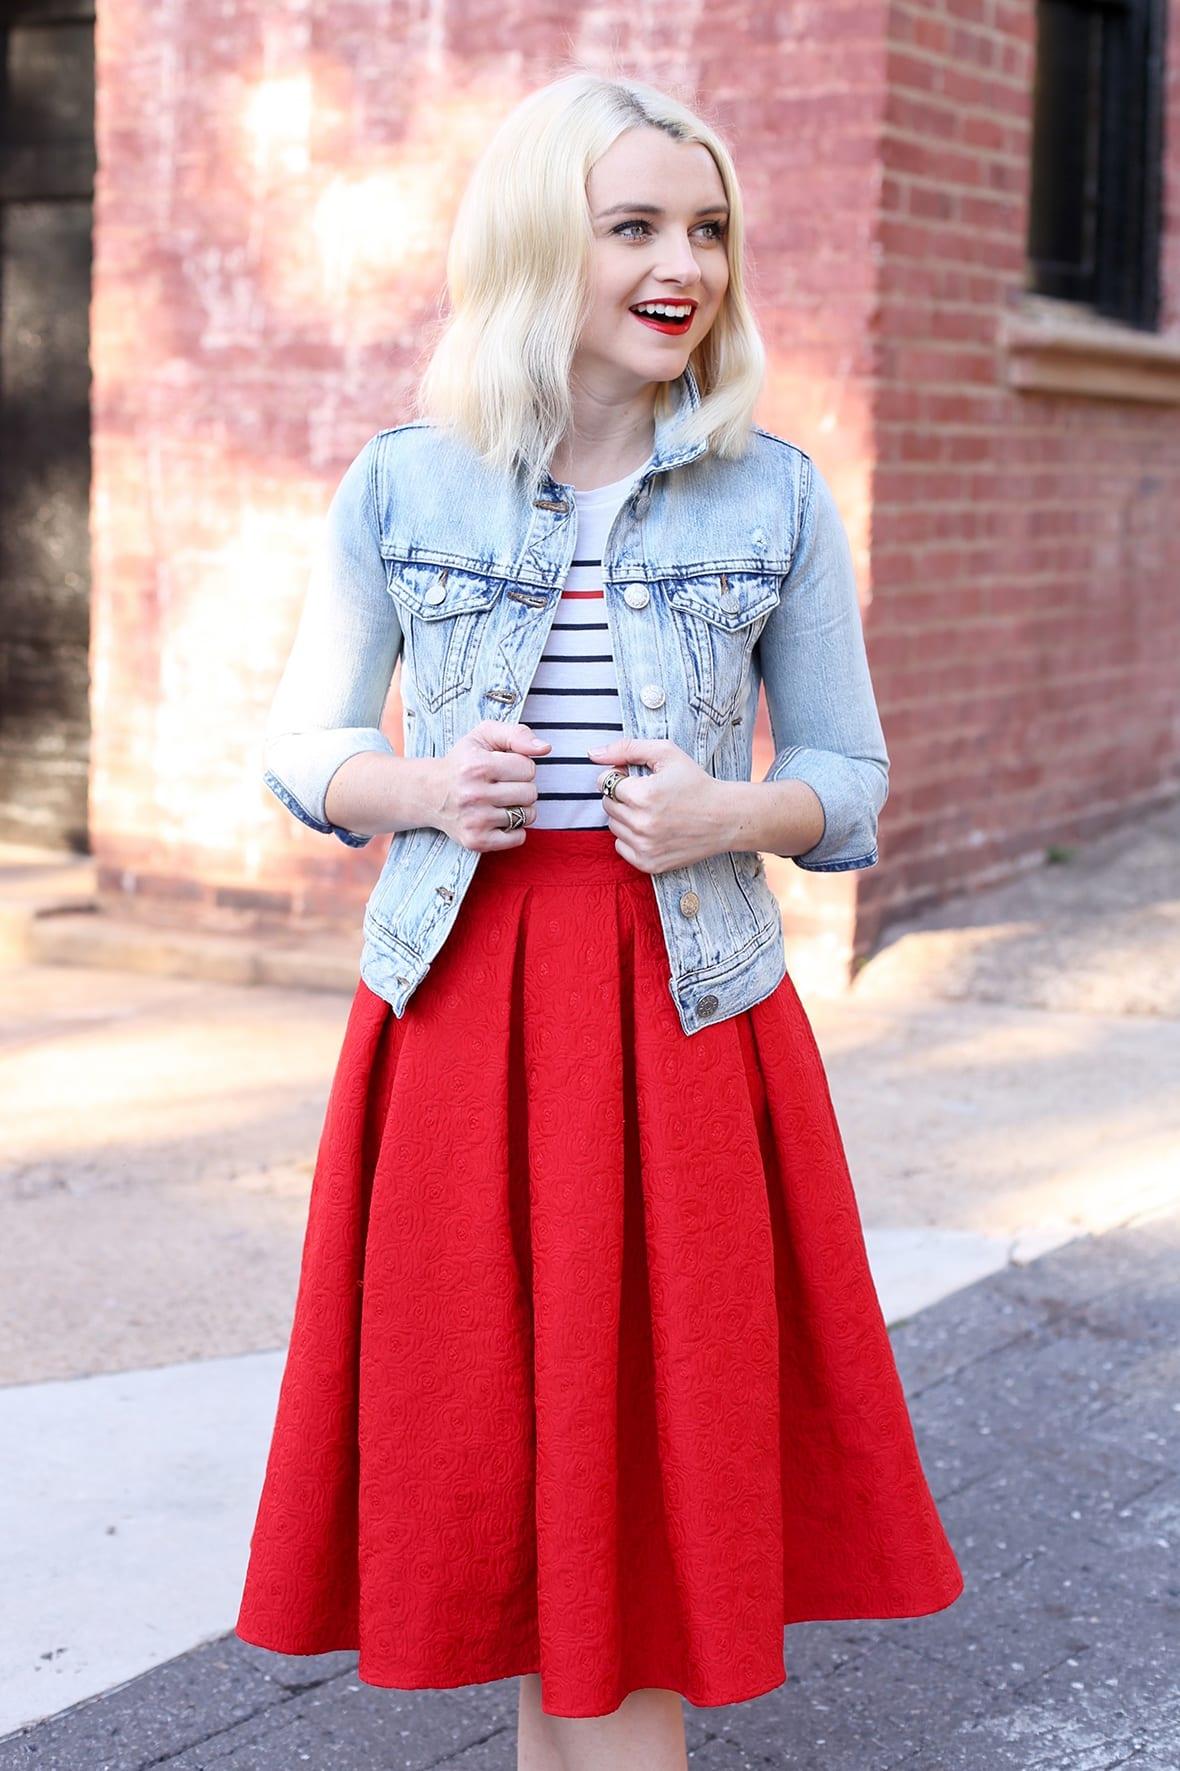 Poor Little It Girl - Red Midi Skirt and Flats - @poorlilitgirl